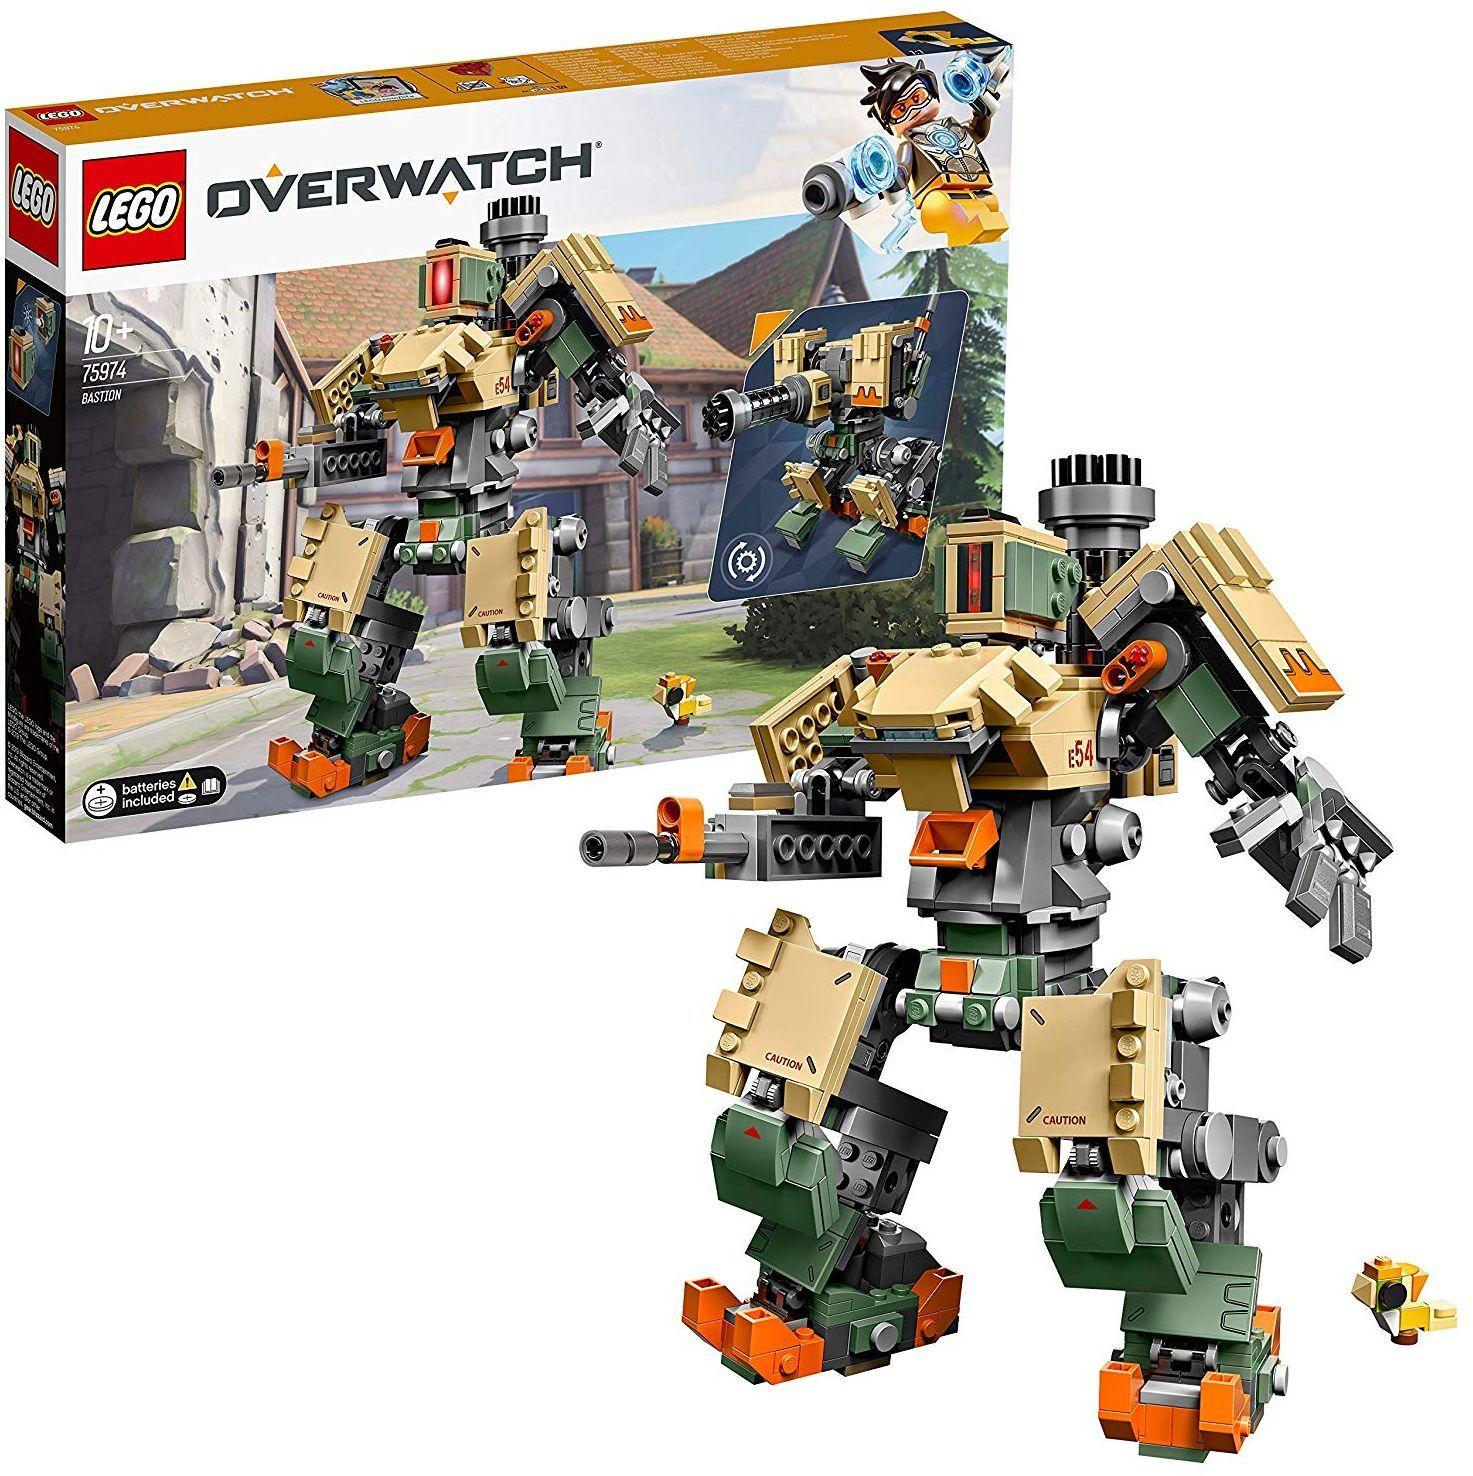 Конструктор Lego Overwatch - Bastion (75974) - 4